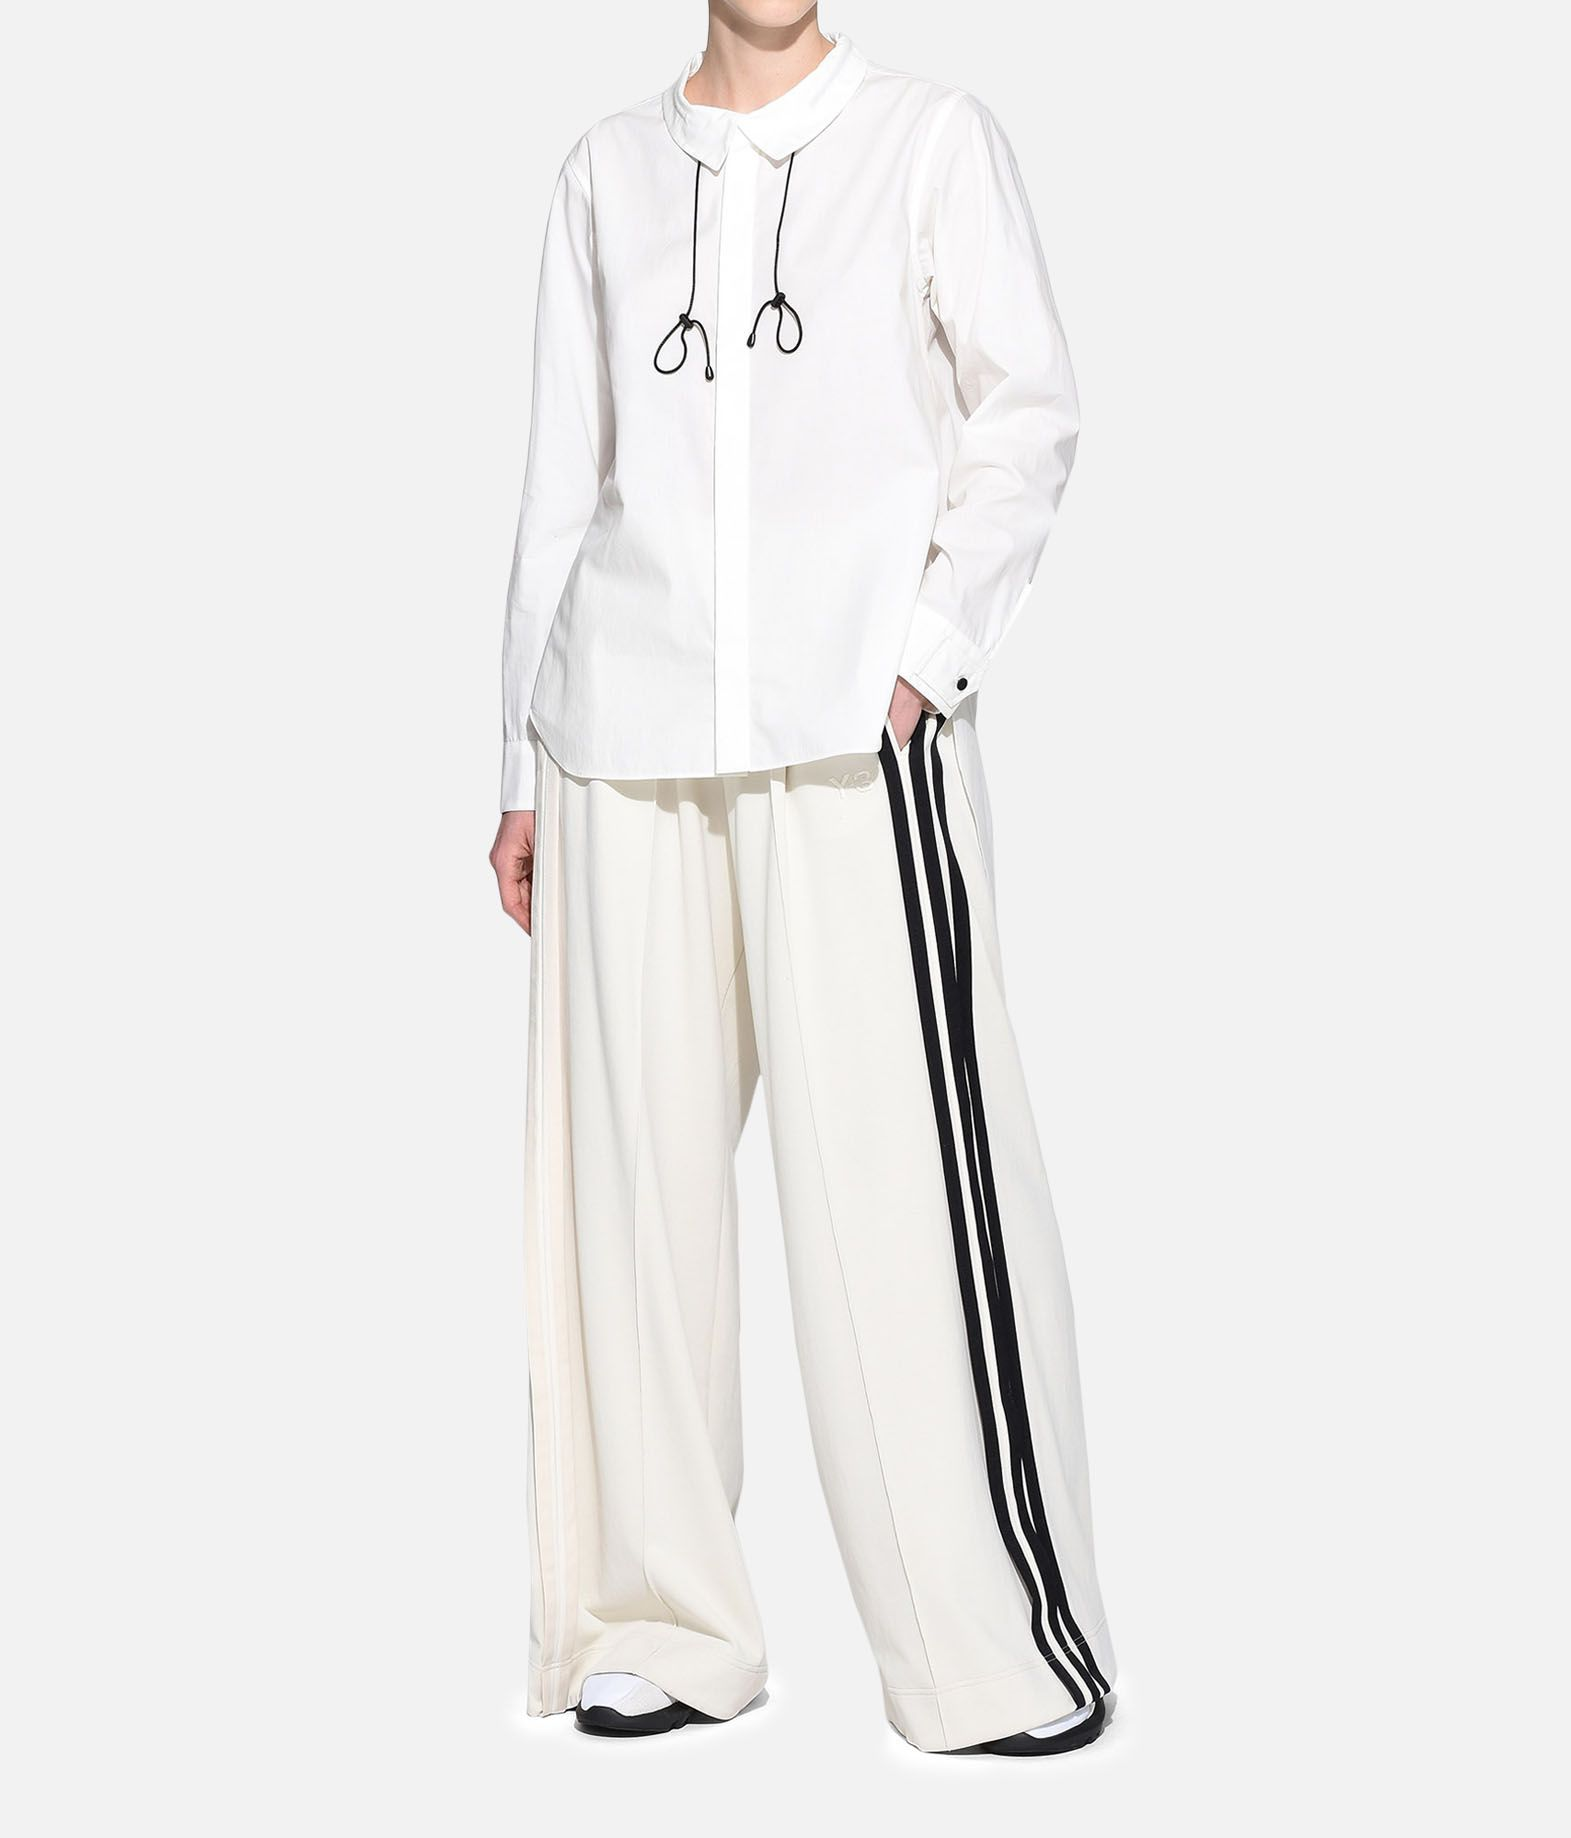 Y-3 Y-3 Tie-Cord Shirt Рубашка с длинными рукавами Для Женщин a